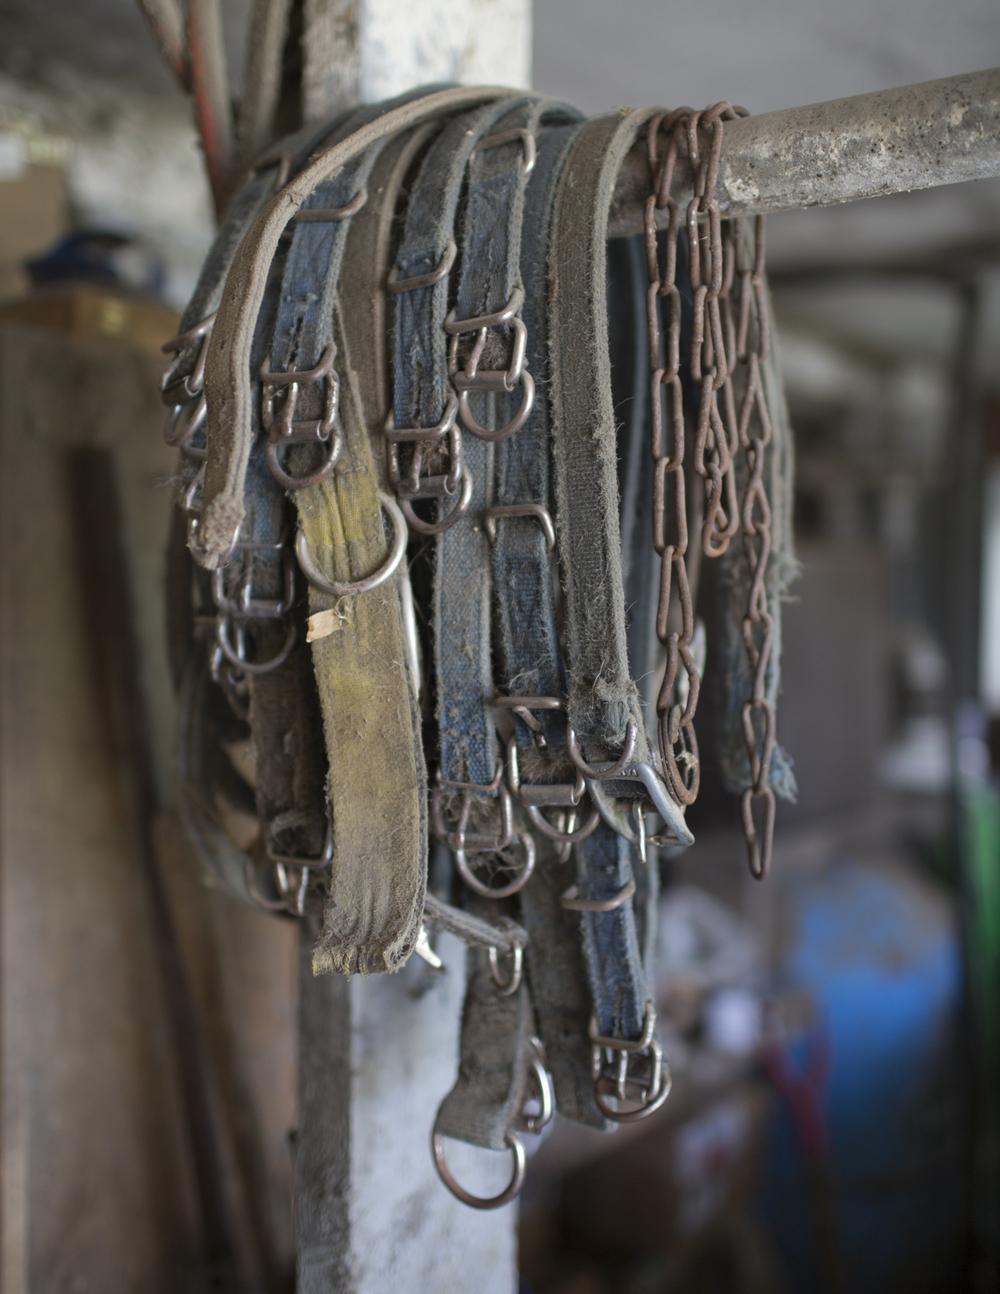 Collar collection